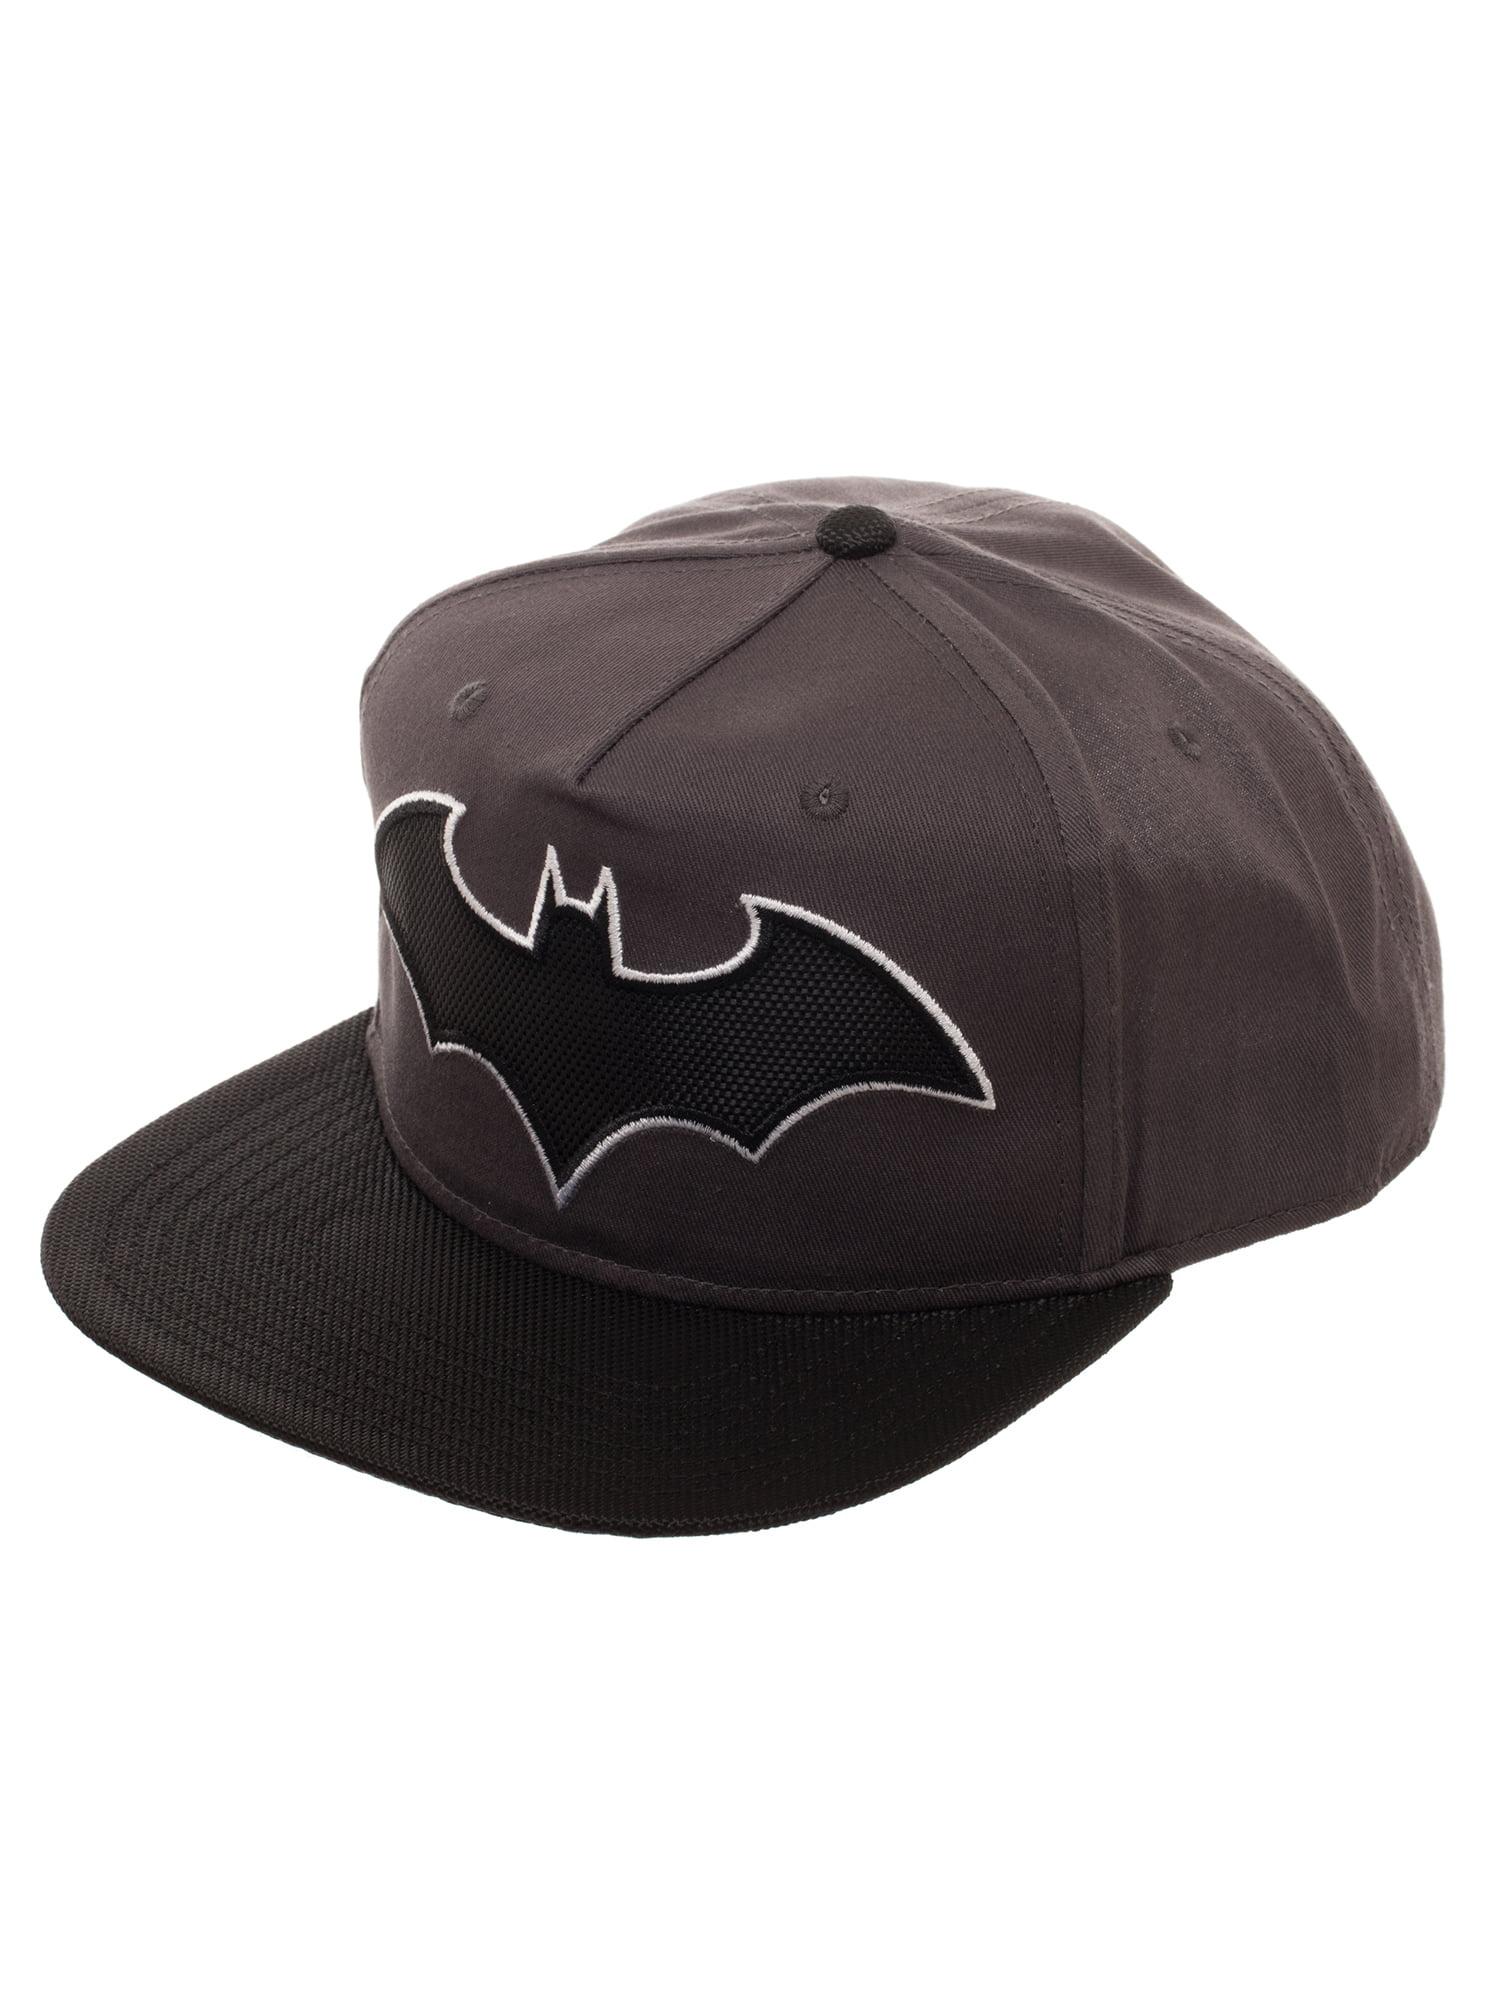 276bcff1e1b Boy s Batman Snapback Hat with Woven Batman Emblem and Flat Bill ...